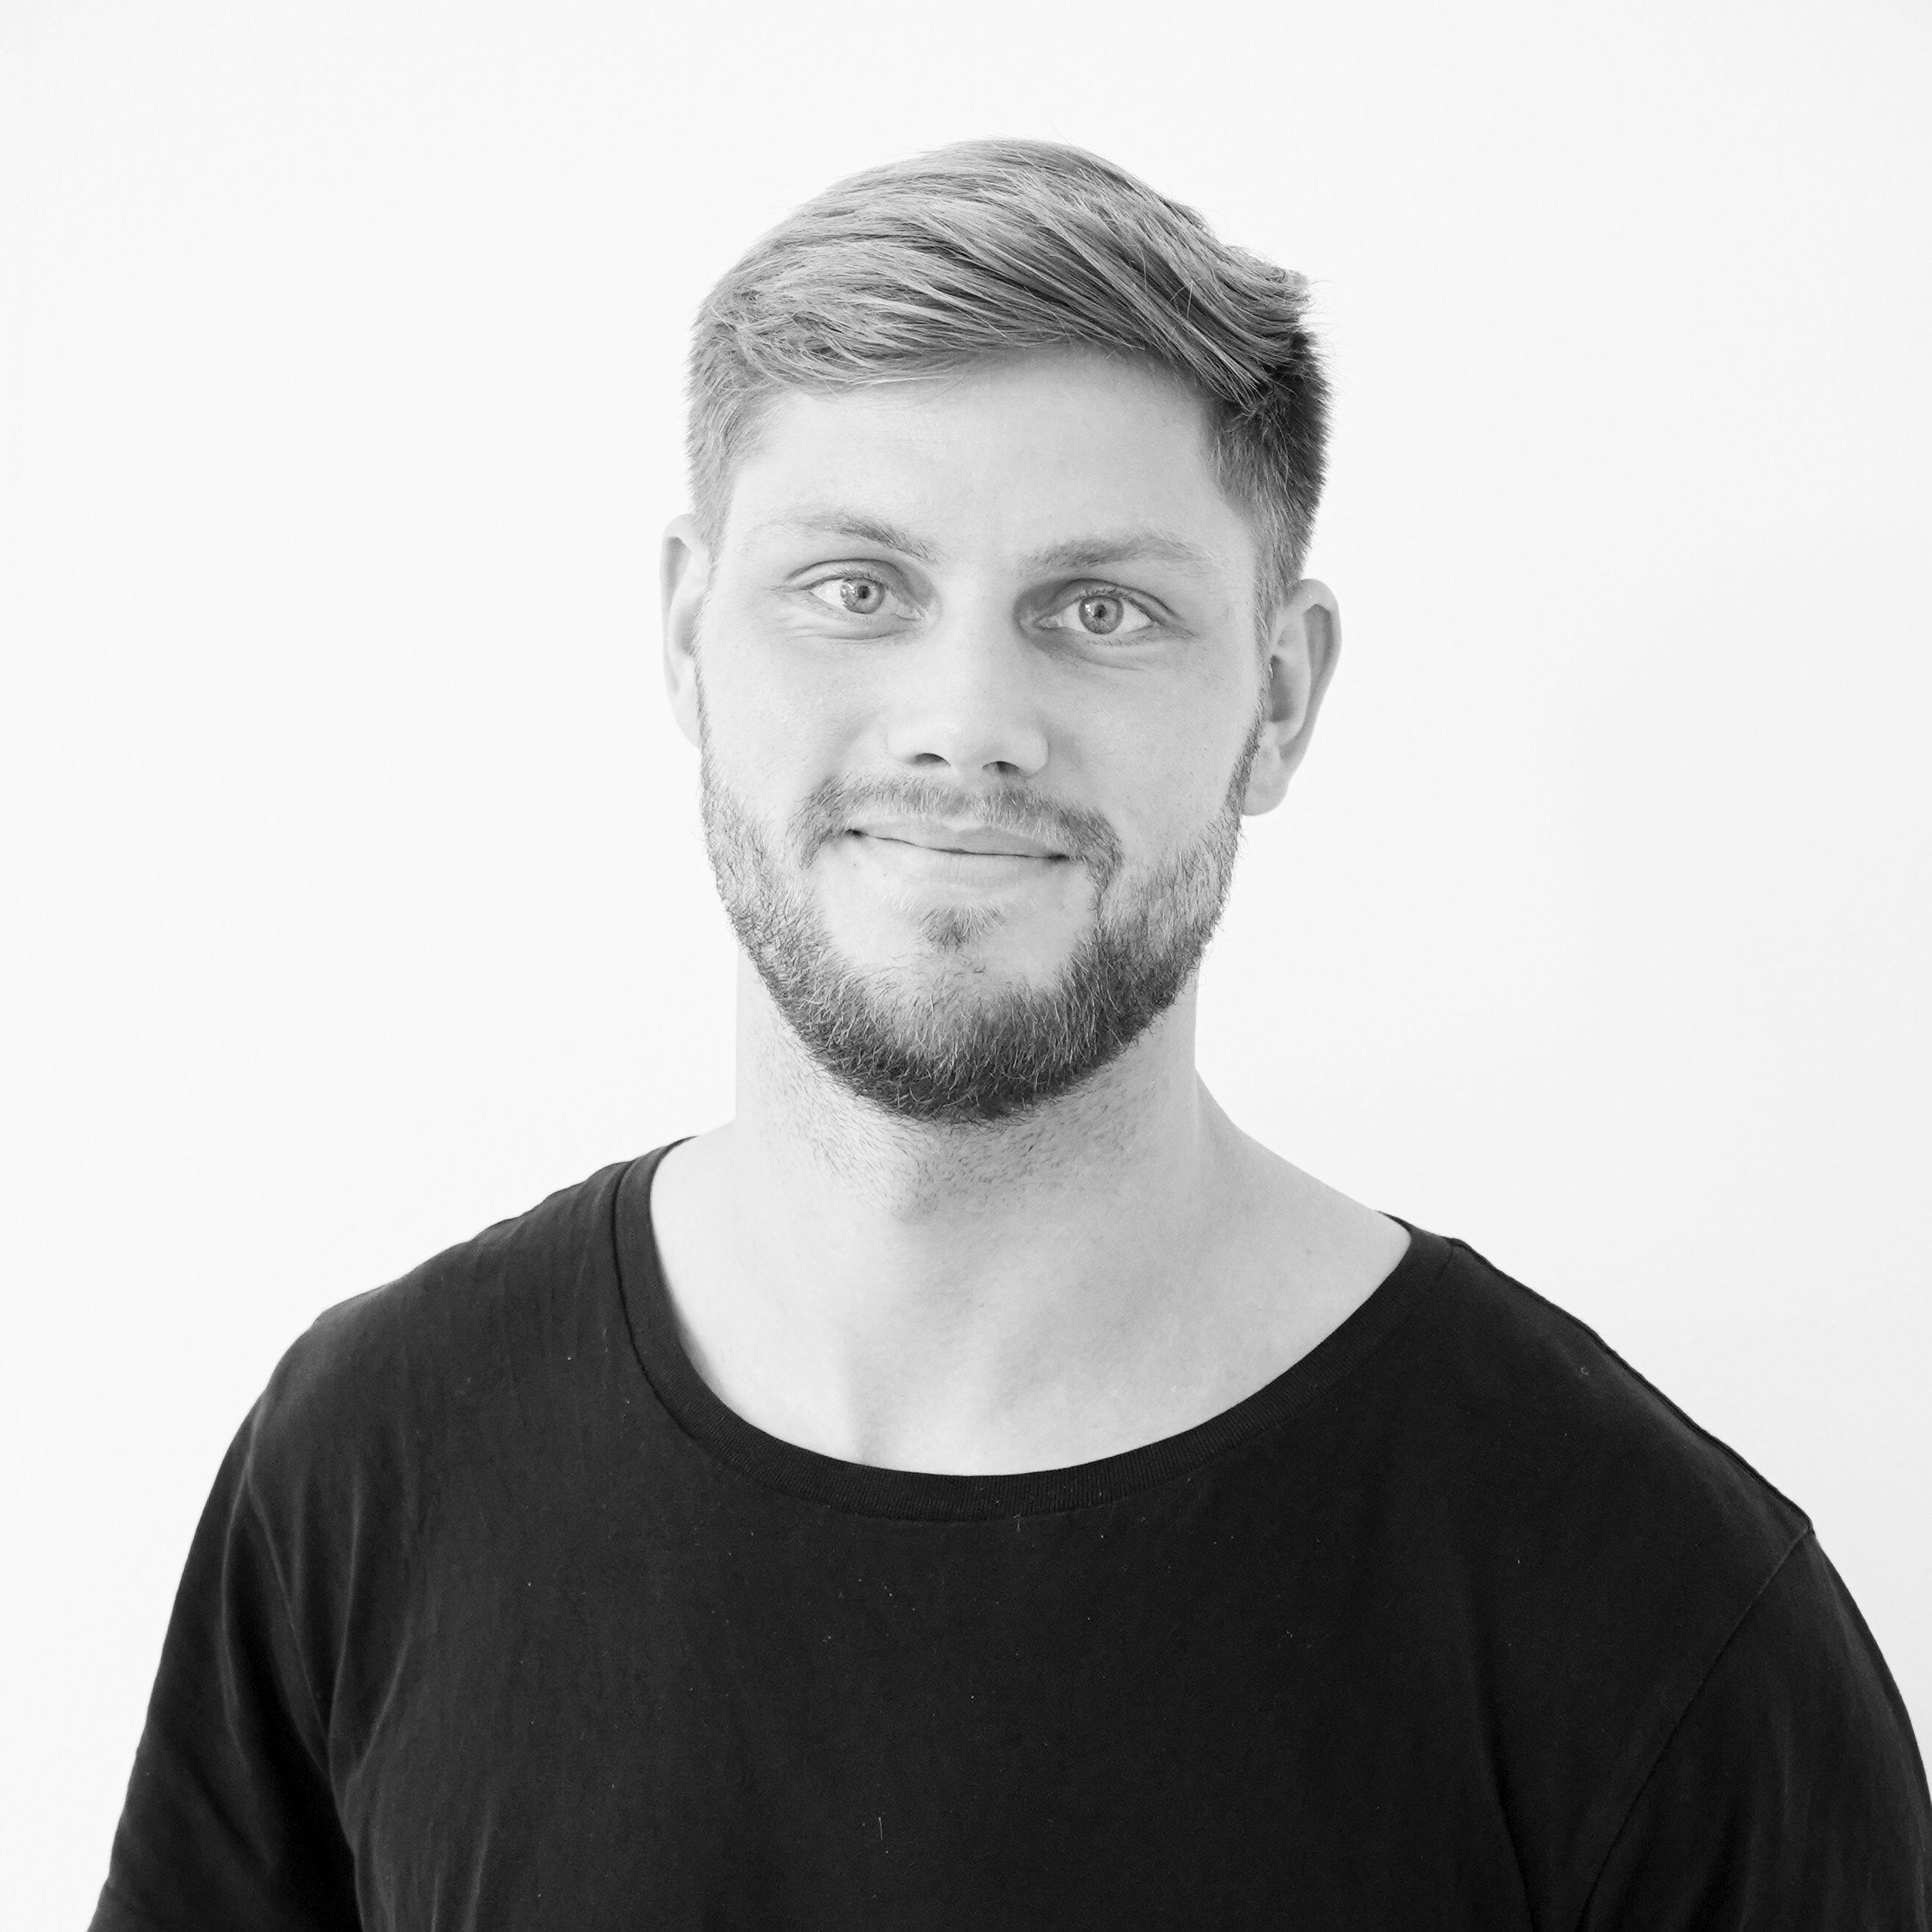 Anders Ravnsholt Riis